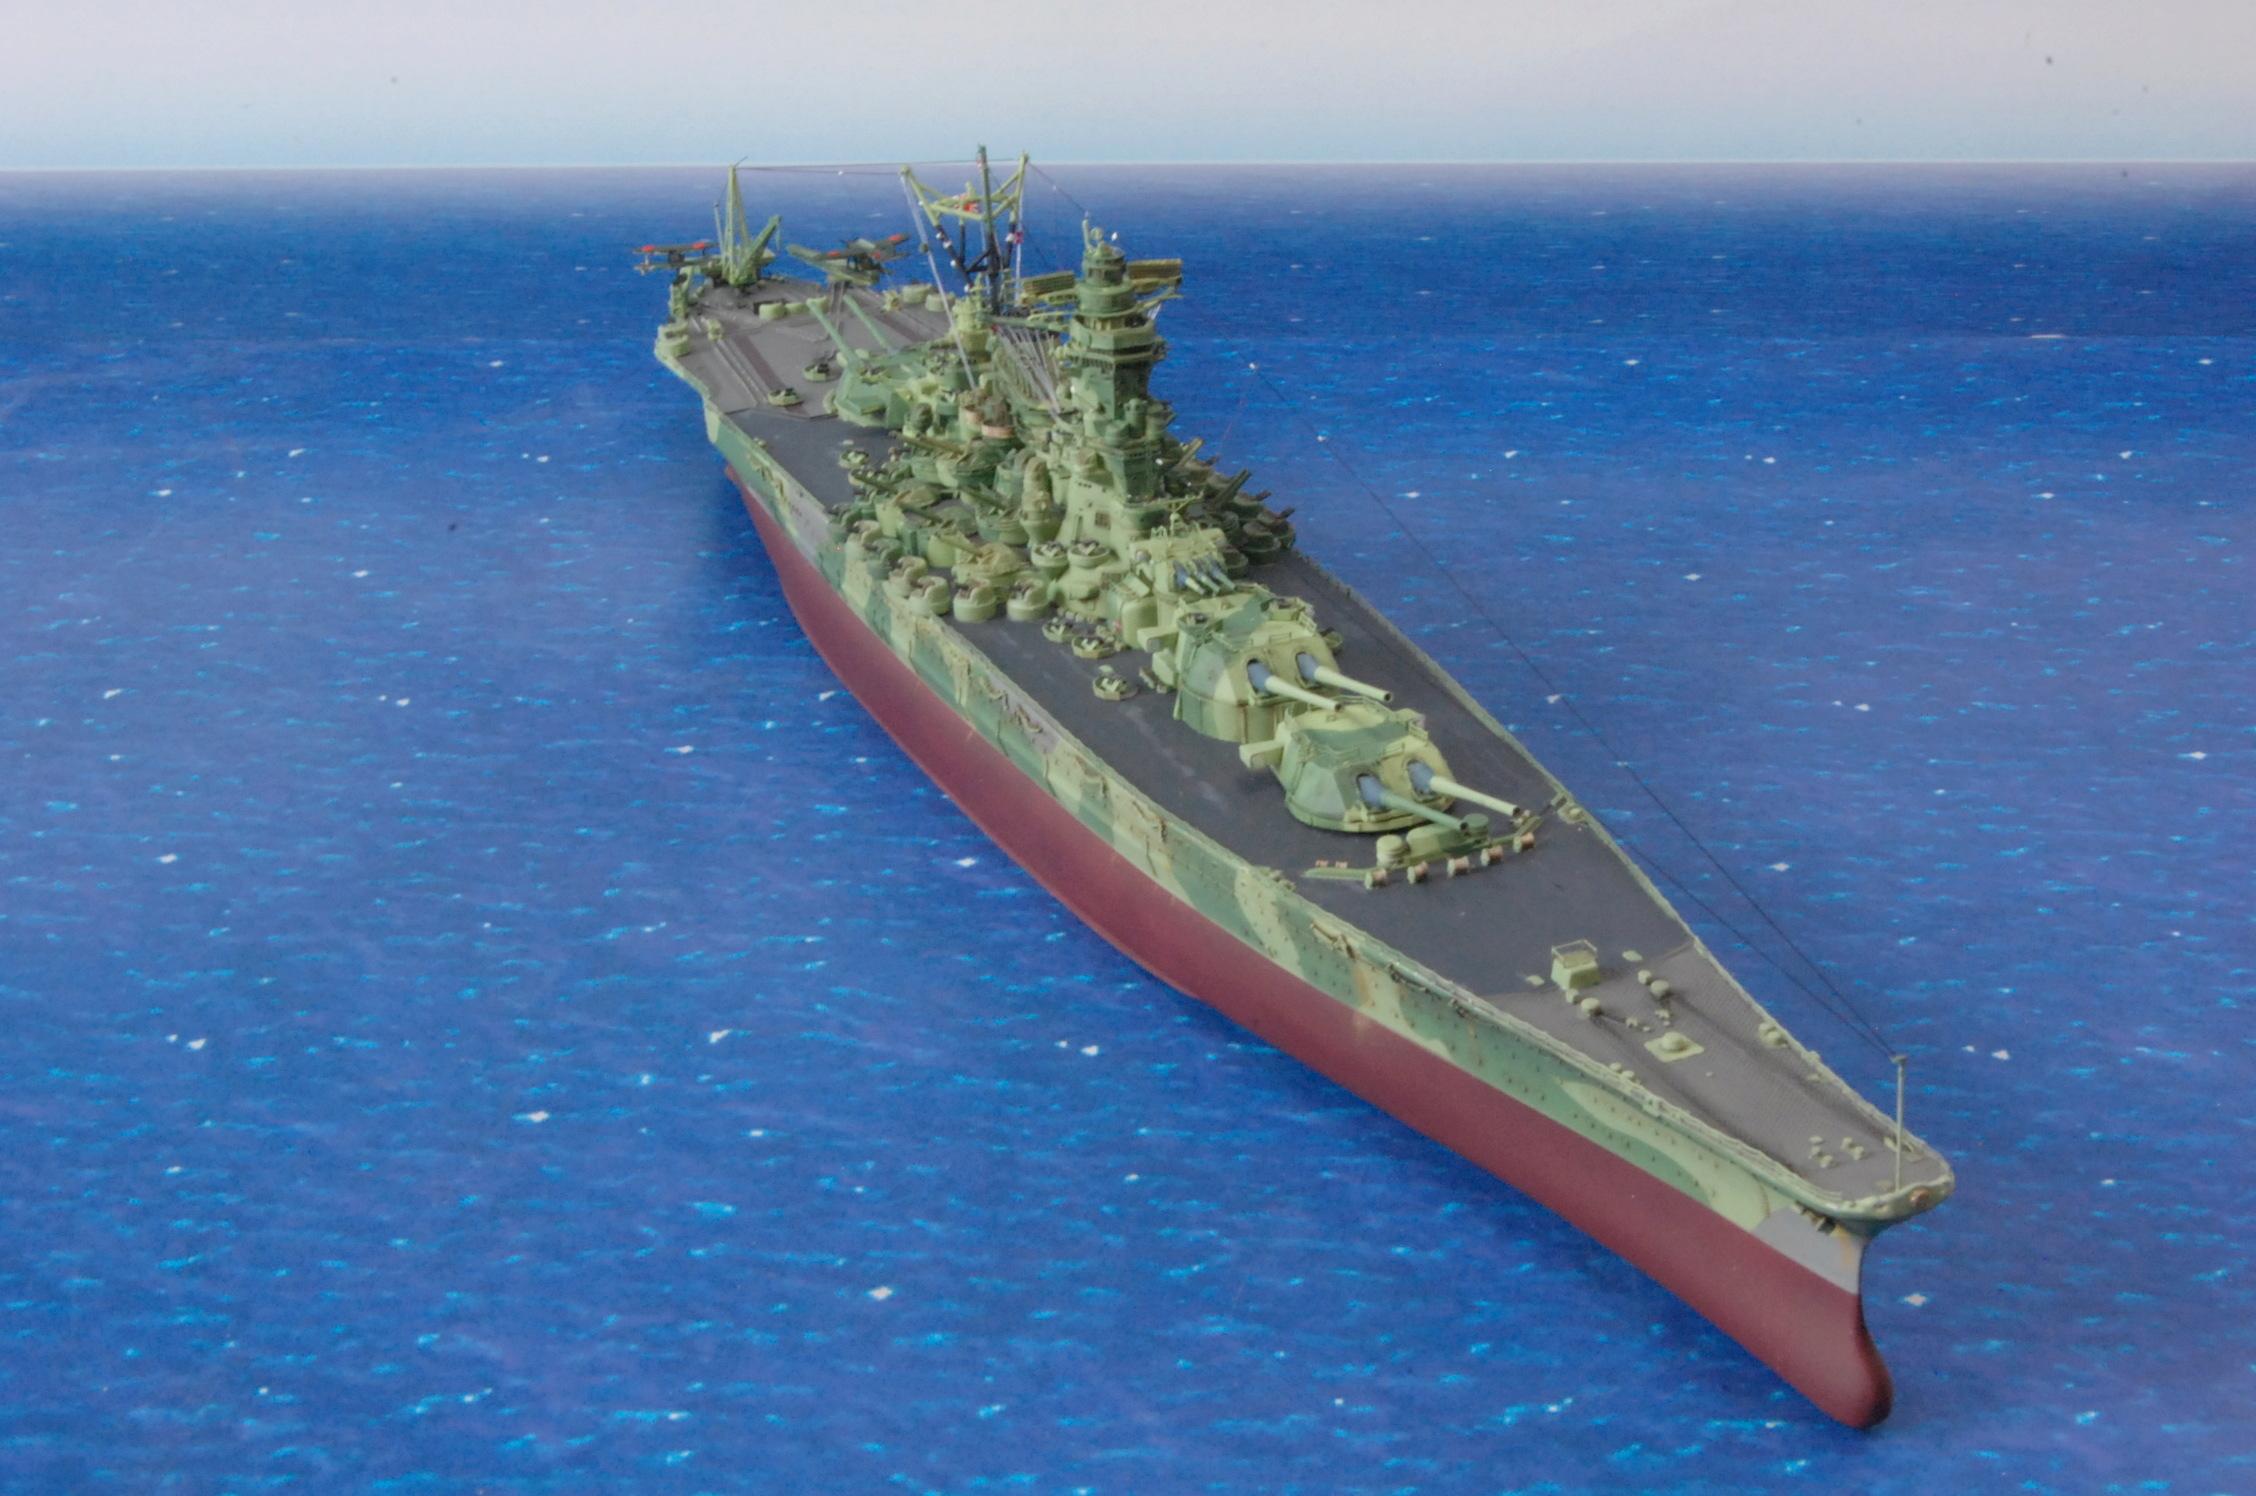 IJN Yamato au 1/200 de chez Nichimo et Fujimi Cam-bi13